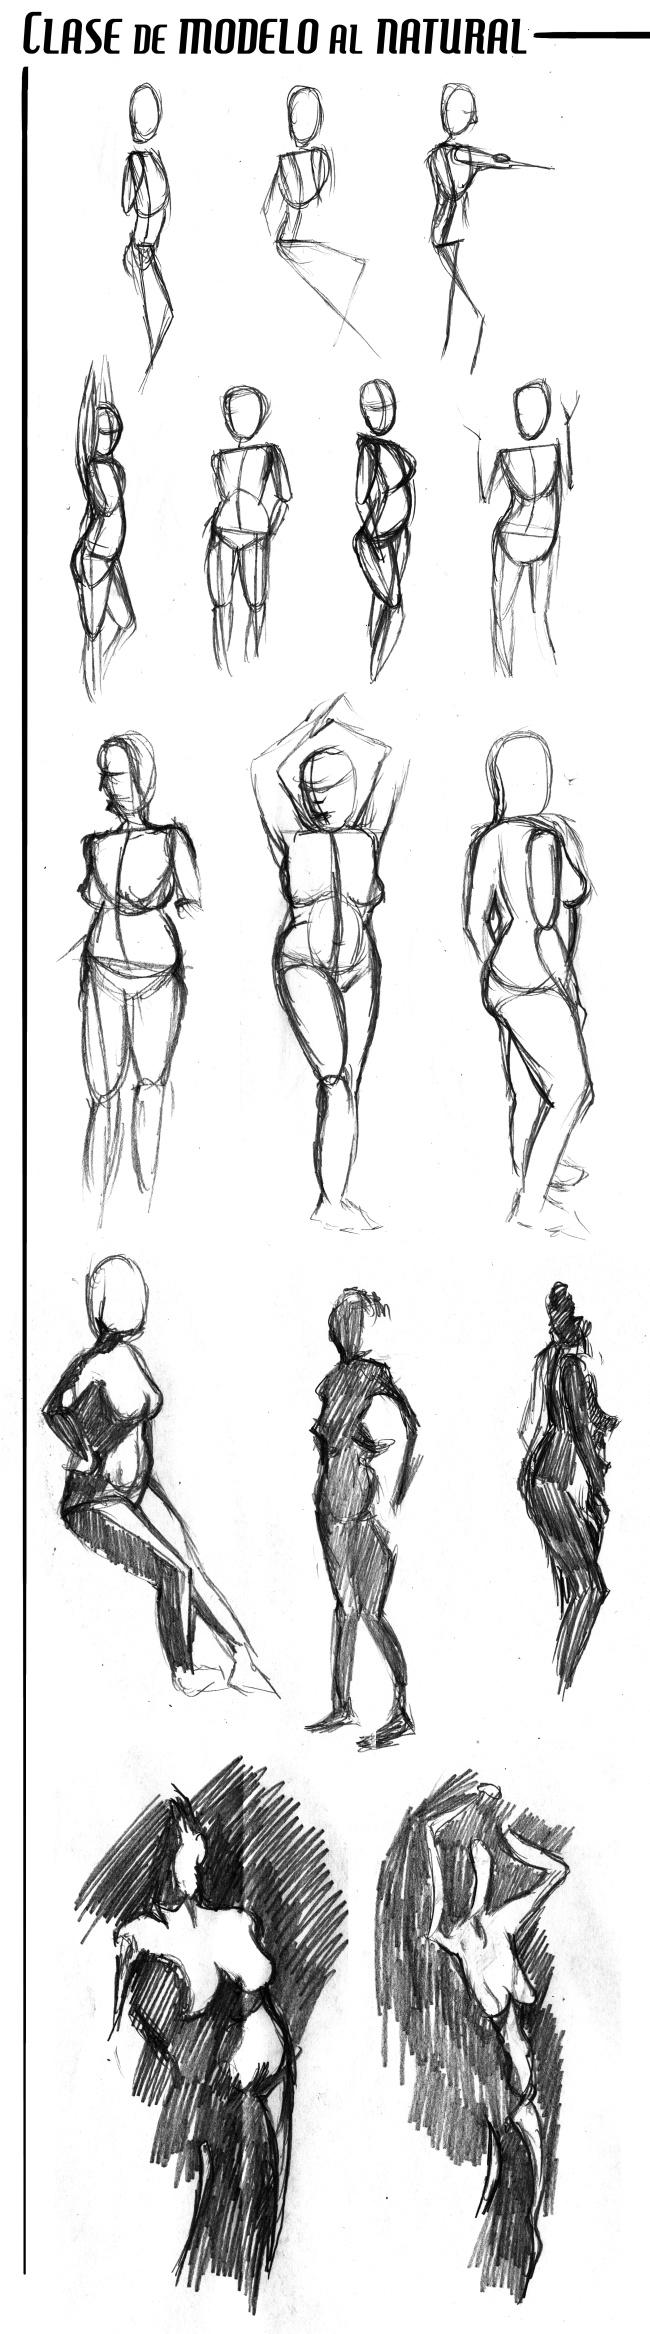 clases-dibujo-natural-posado-comic-madrid-academiac10-dibujar